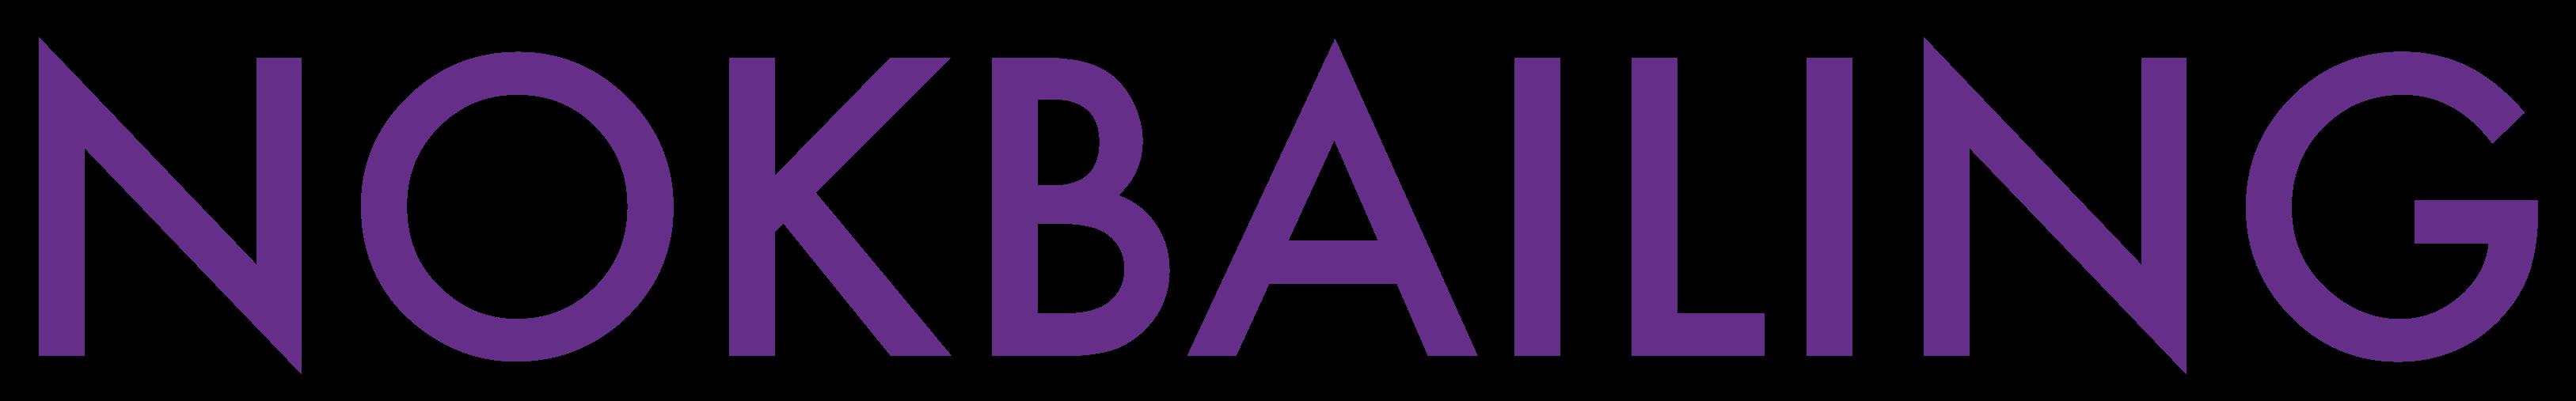 logo-3-01